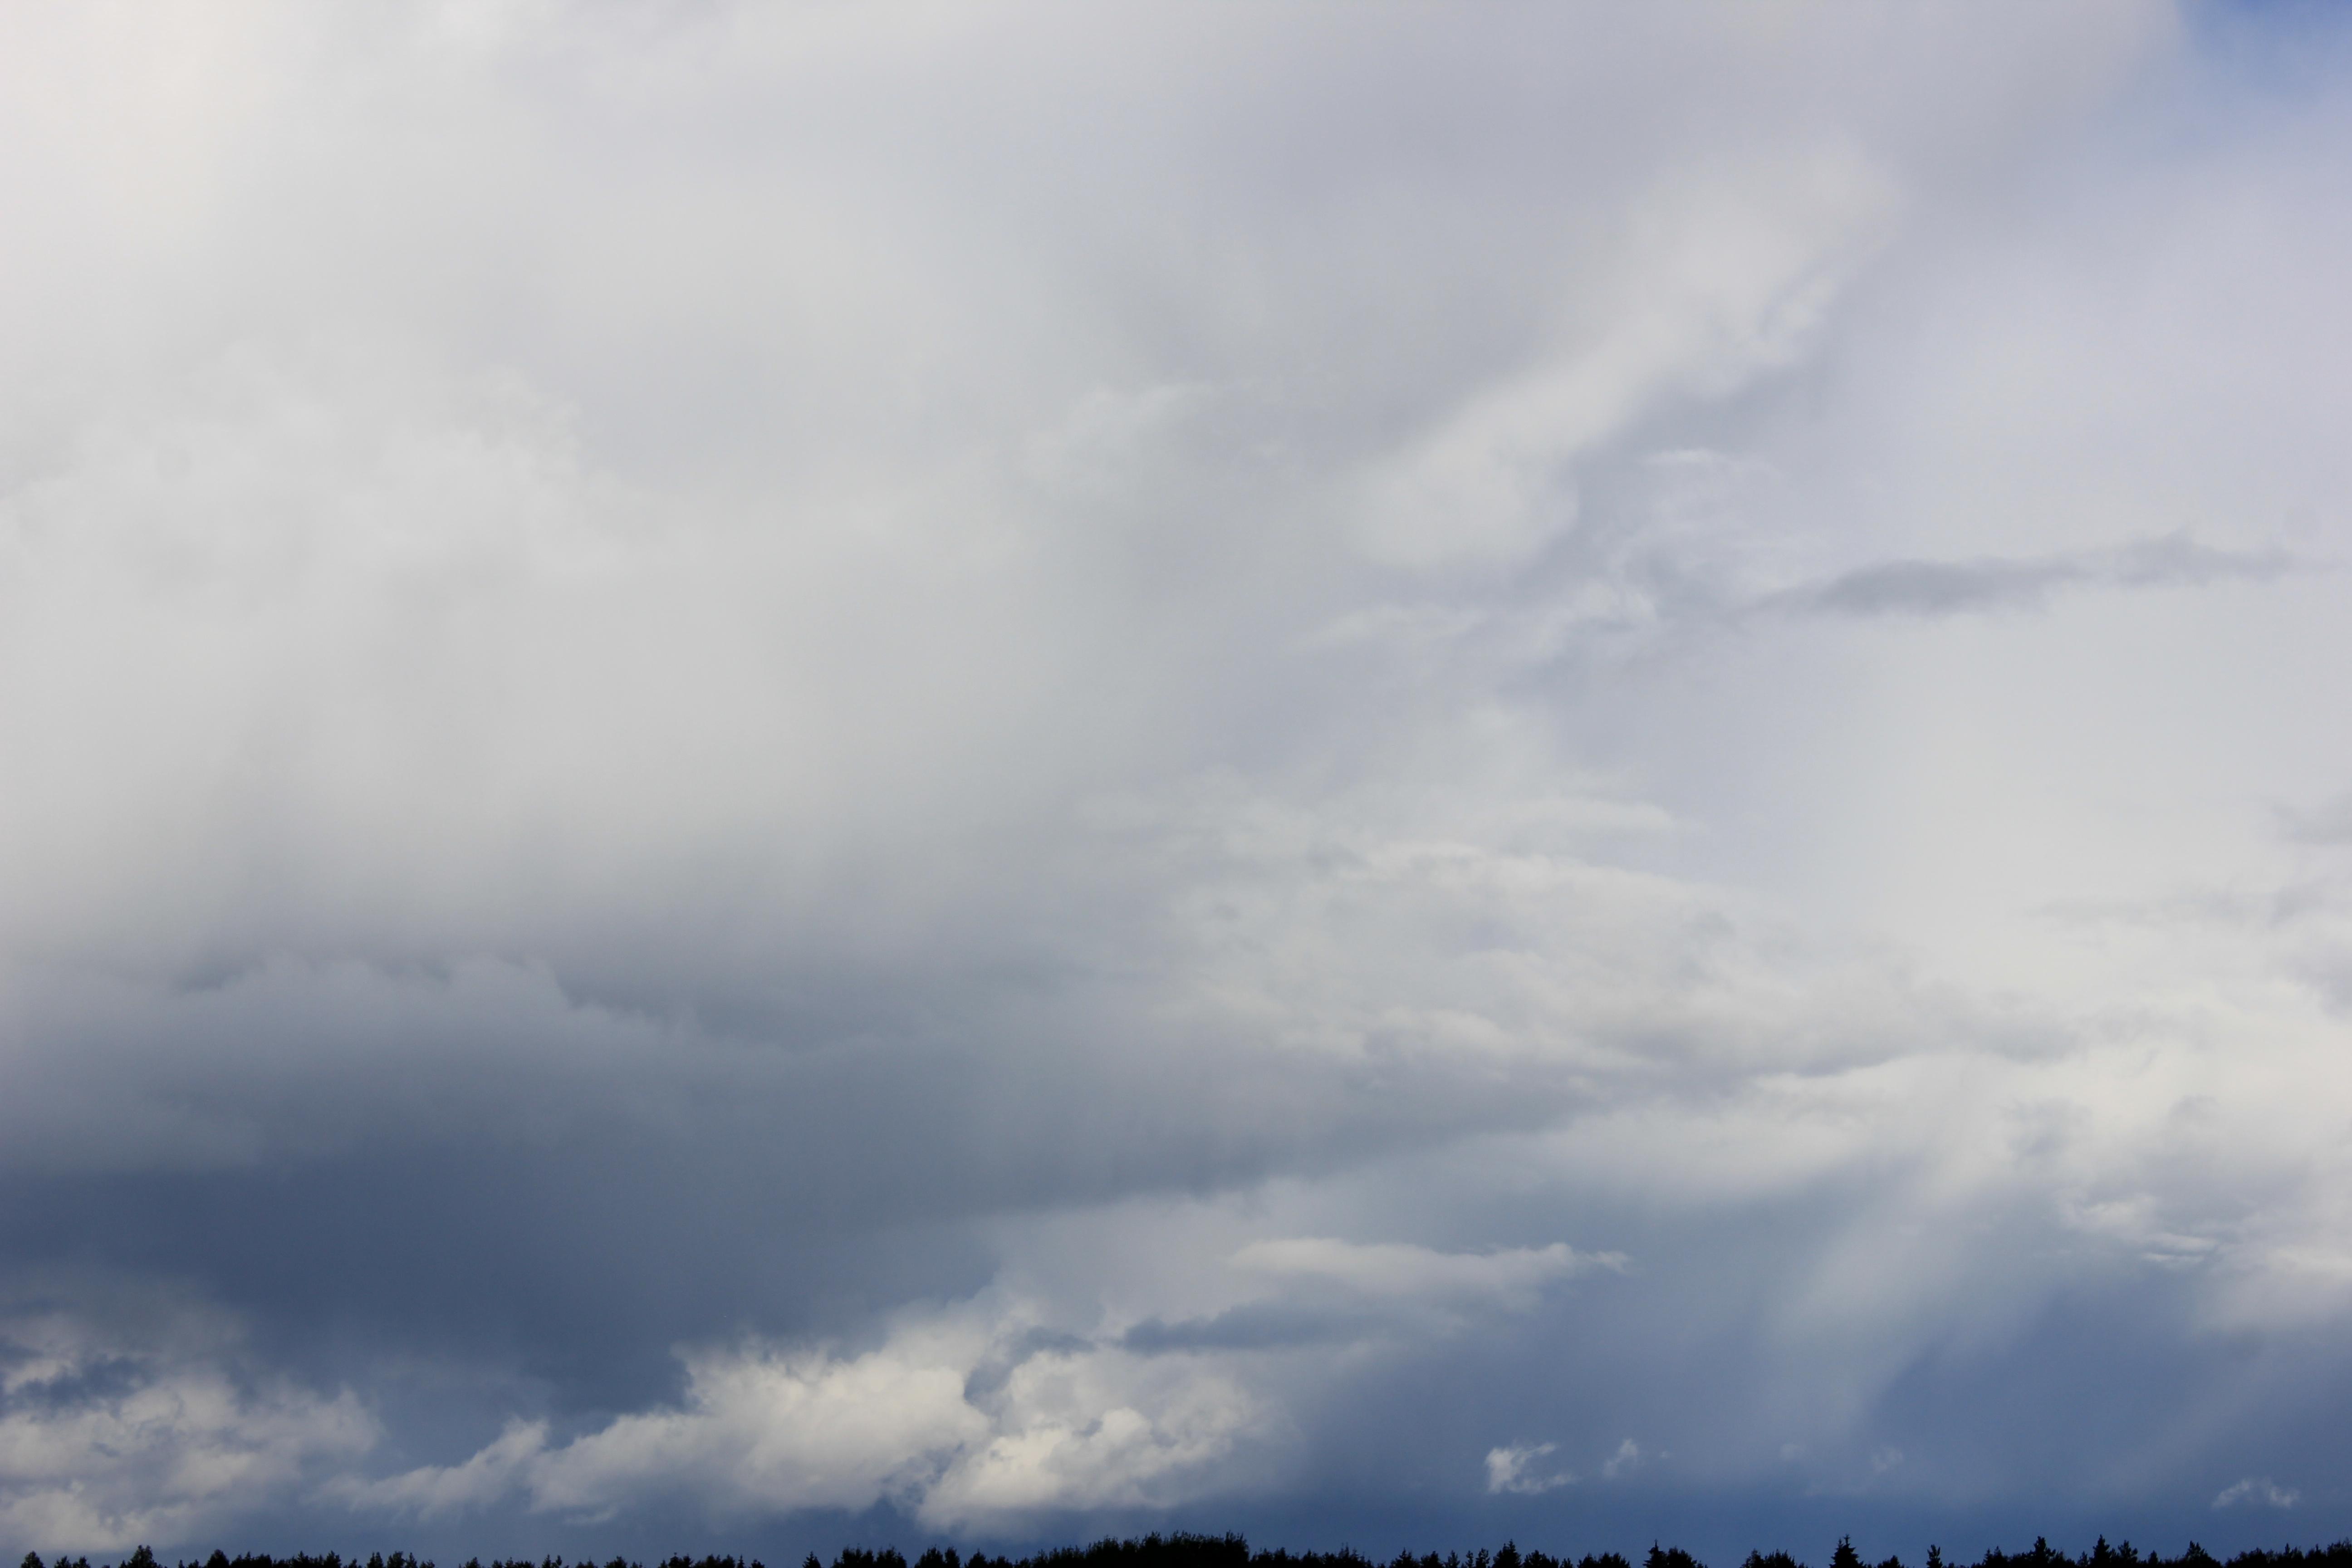 прелести небо сентября (18)